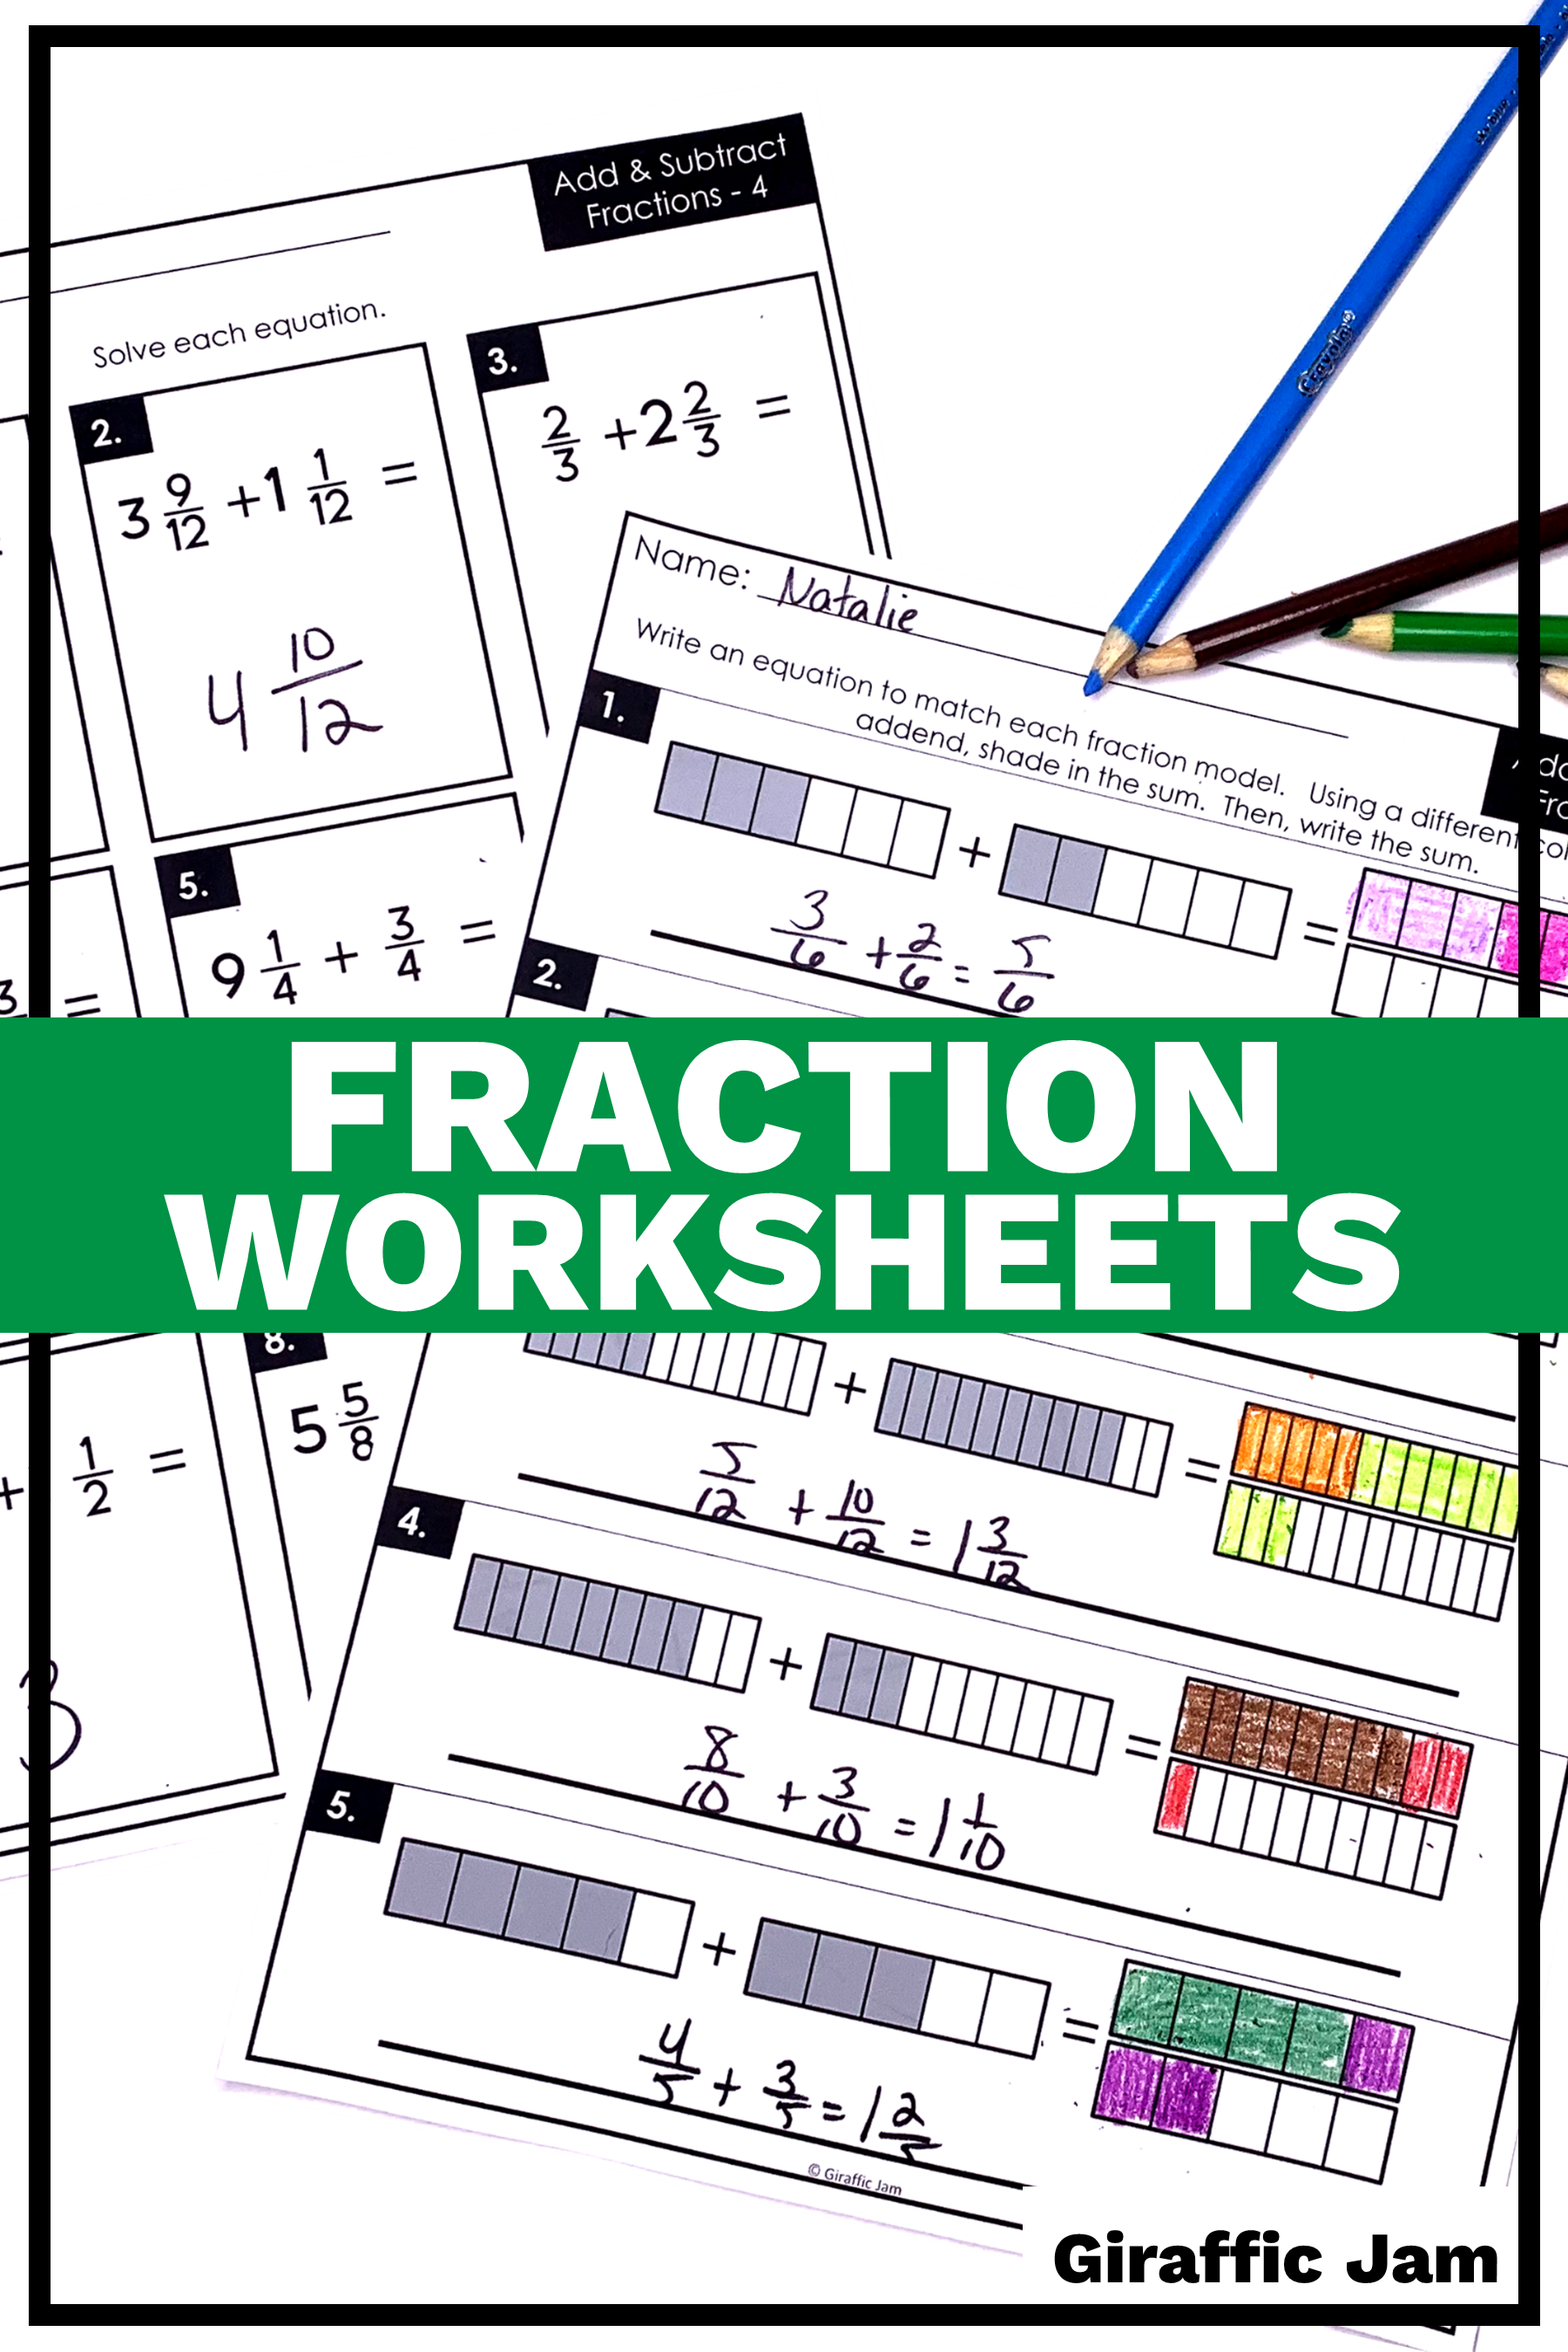 4th Grade Liquid Measurement Worksheets   Printable Worksheets and  Activities for Teachers [ 2700 x 1800 Pixel ]